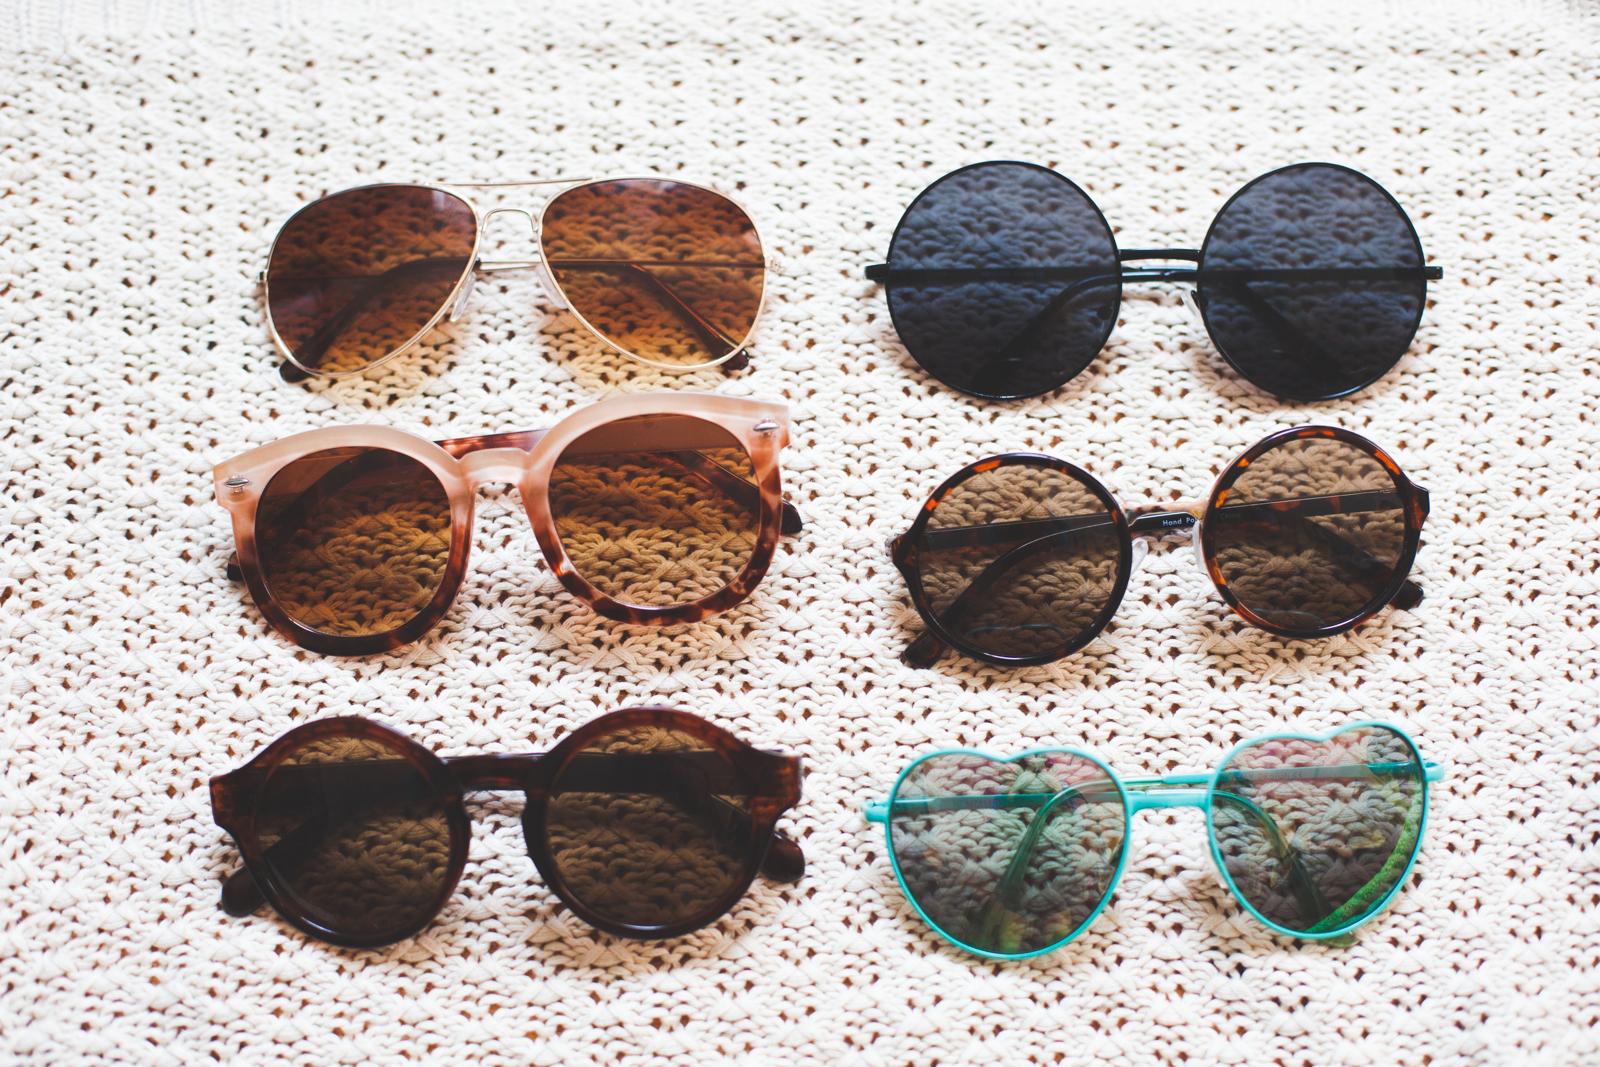 Sunglasses Storage Solution